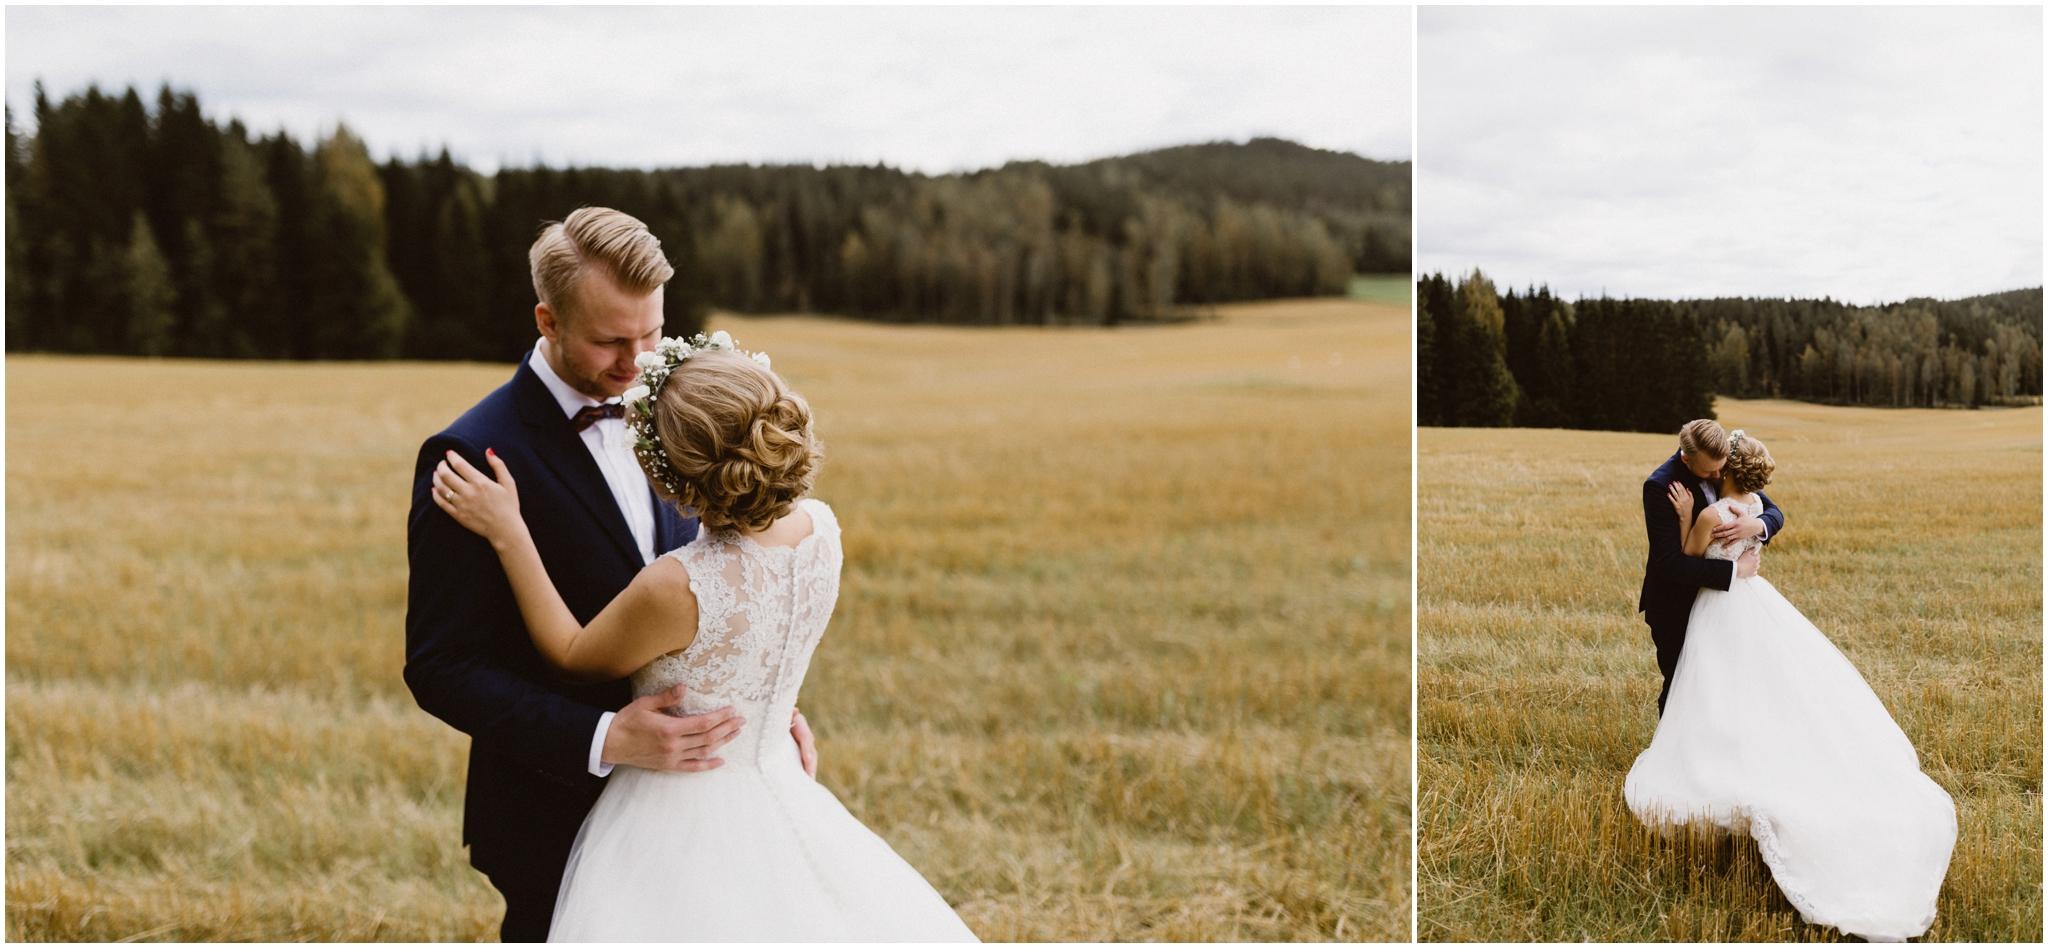 Leevi + Susanna -- Patrick Karkkolainen Wedding Photographer + Adventurer-116.jpg